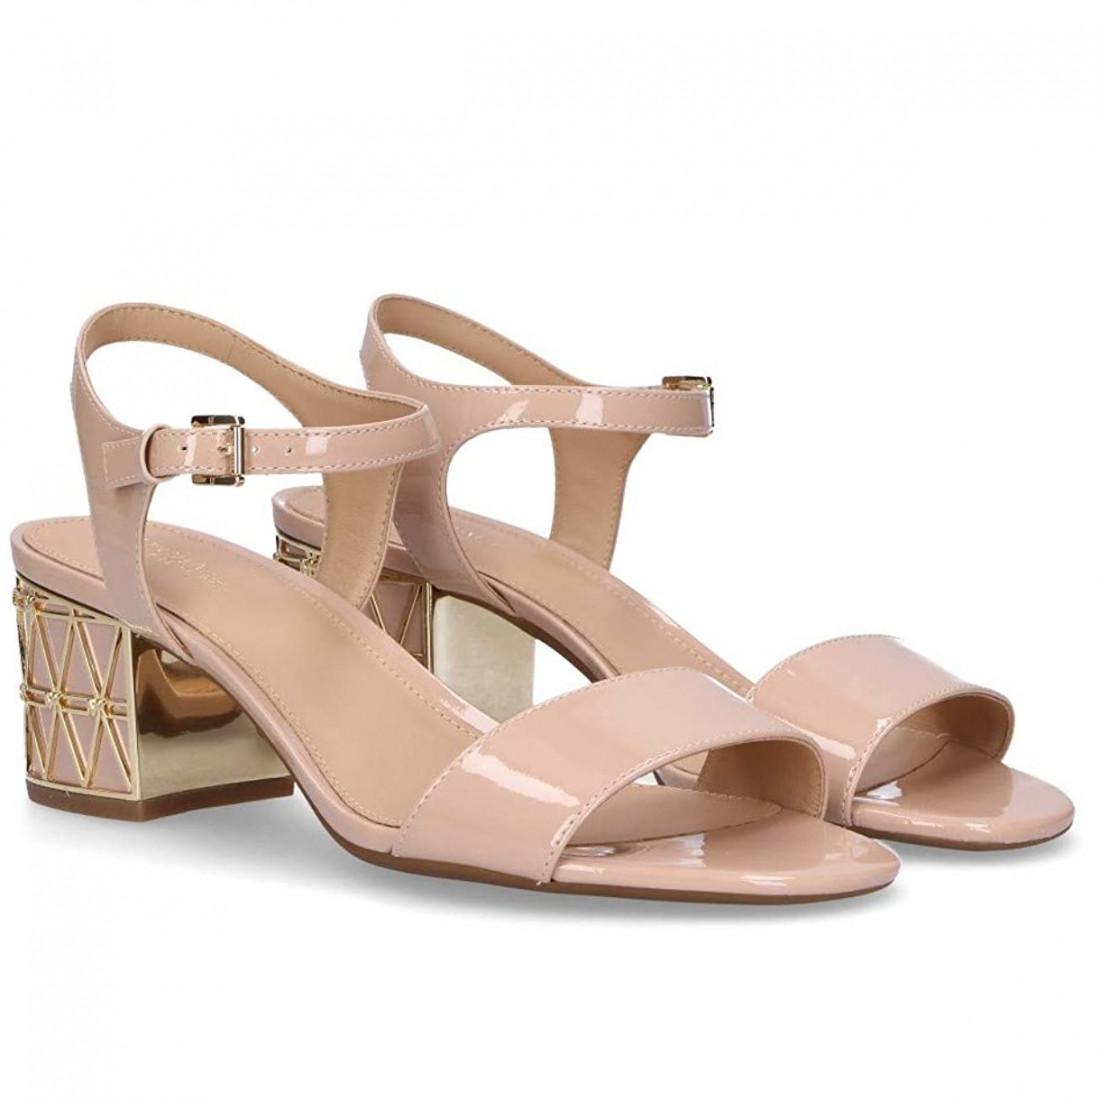 sandalen damen michael kors 40s9bkms1a660 7399